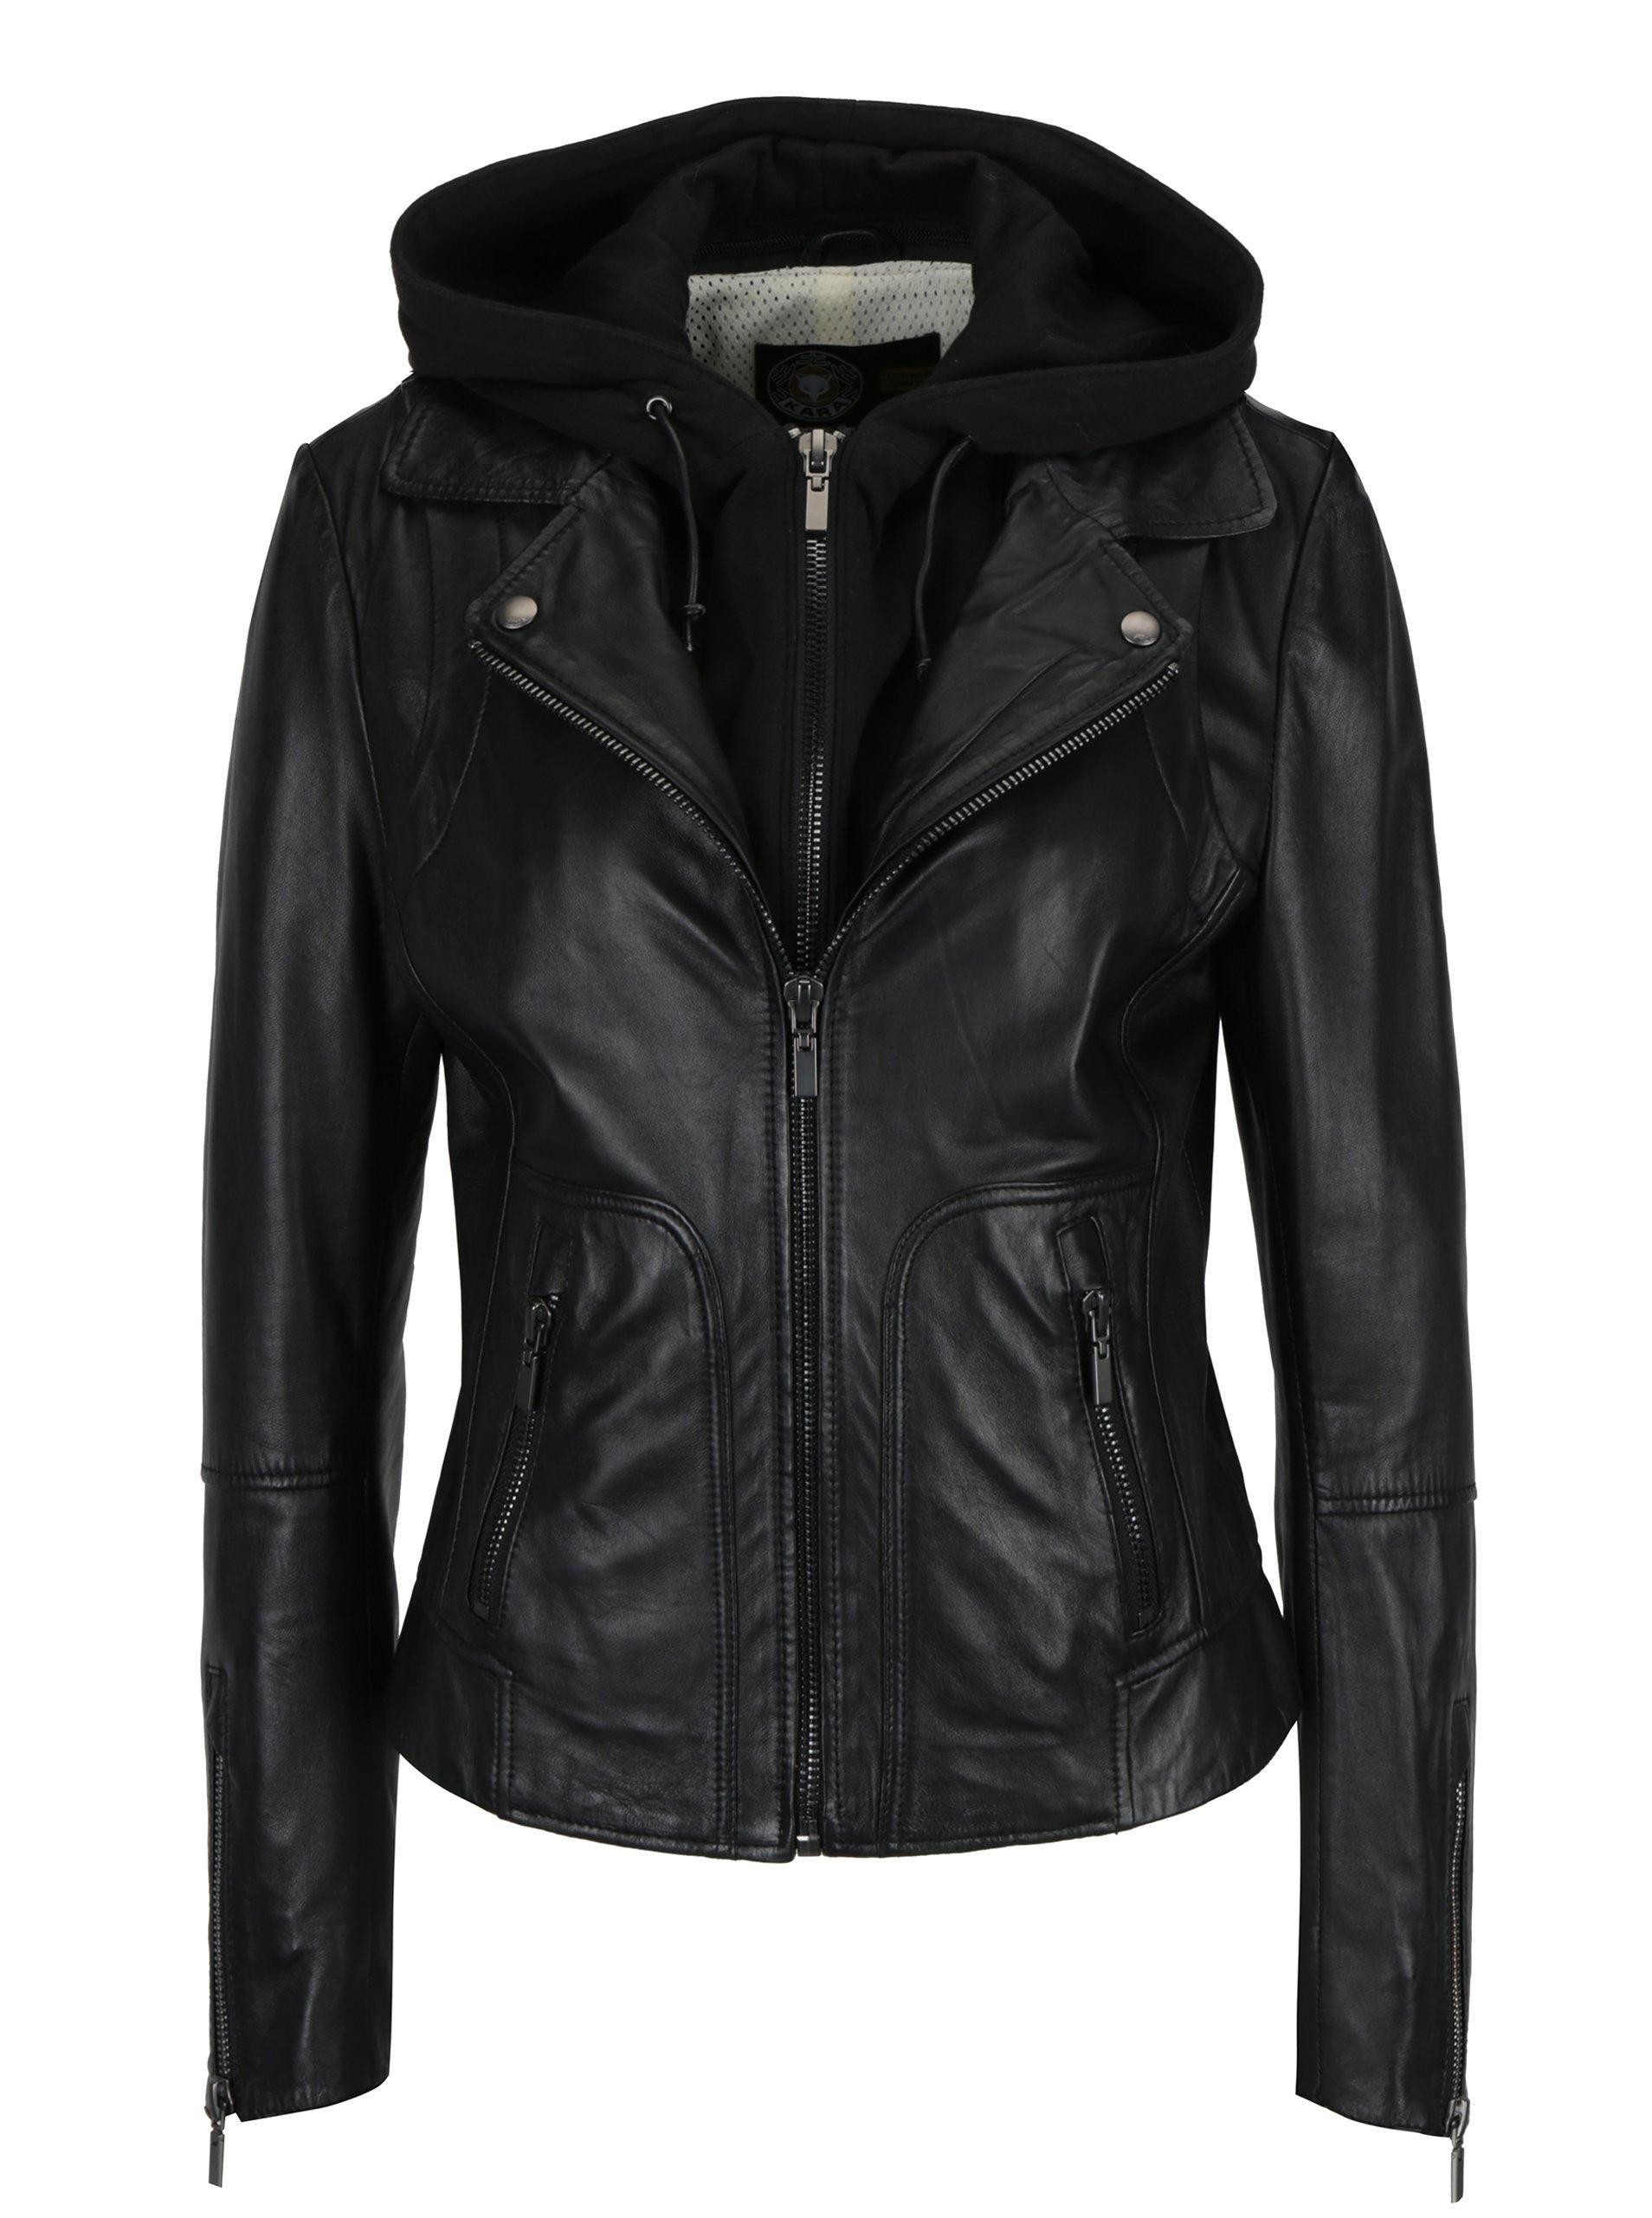 Černá dámská kožená bunda s kapucí KARA Preto